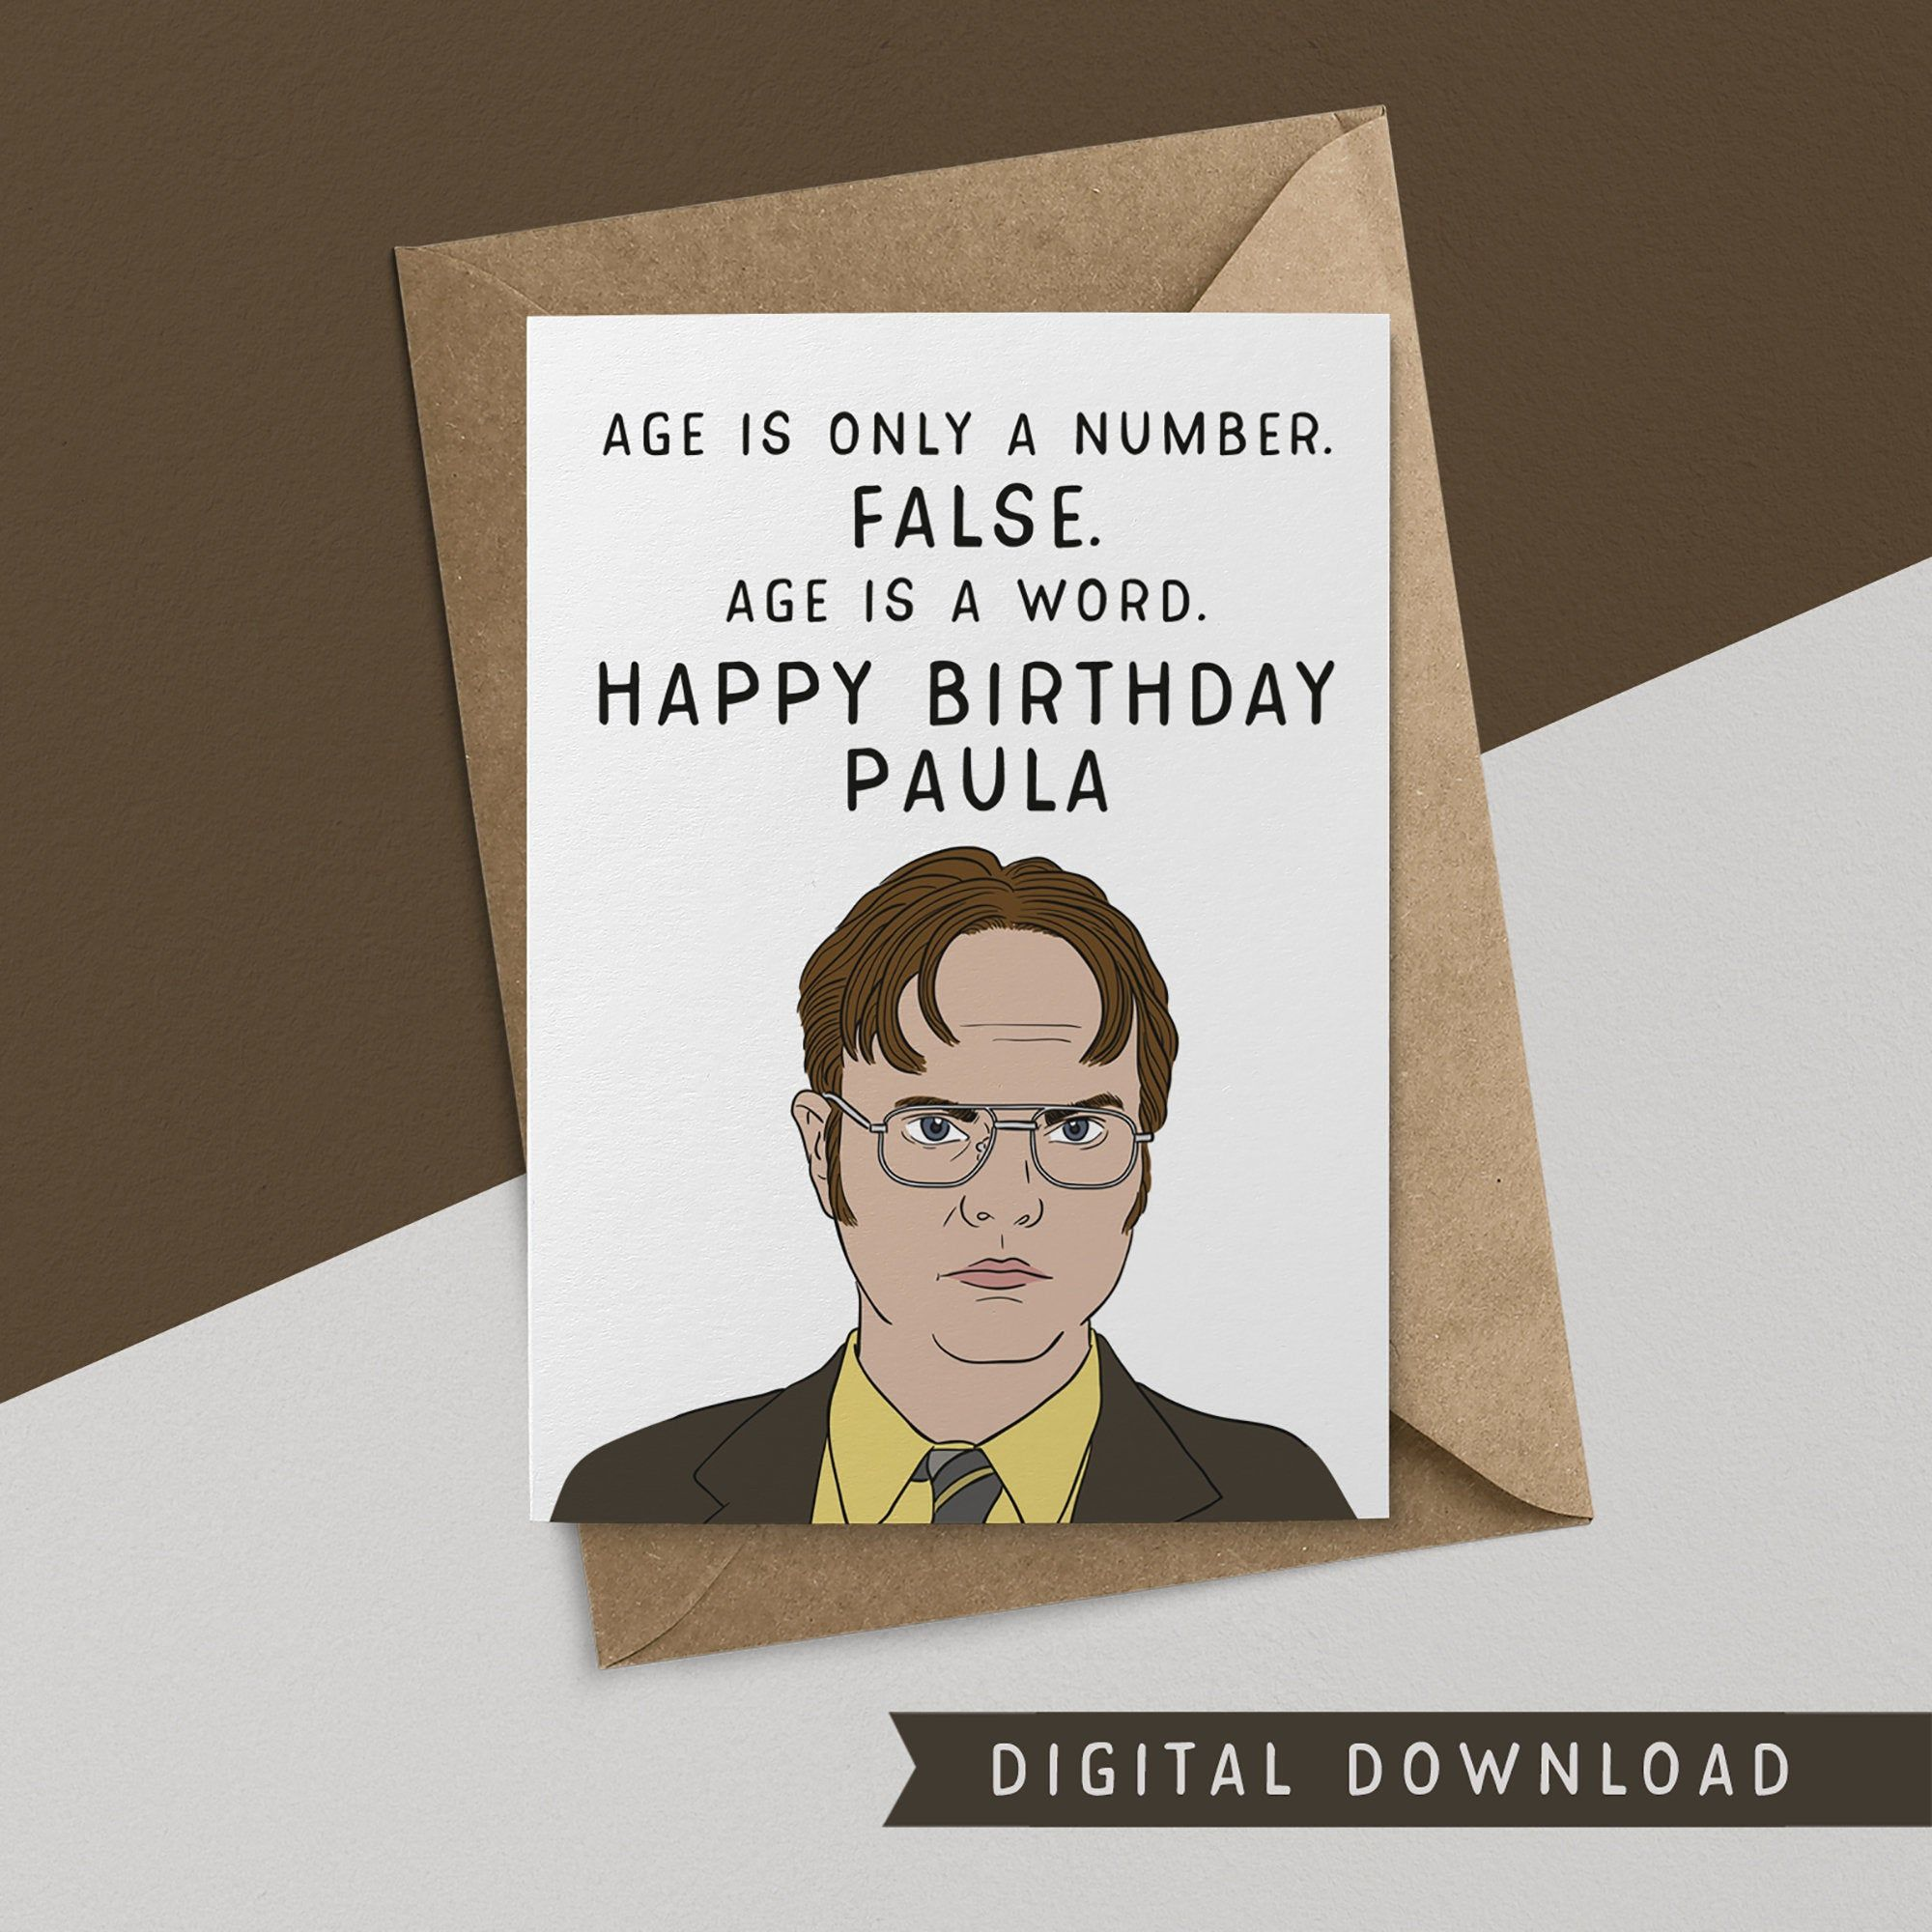 Buy 1 Get 1 Free Printable Birthday Card Instant Download Etsy Free Printable Birthday Cards Happy Birthday Cards Funny Birthday Cards